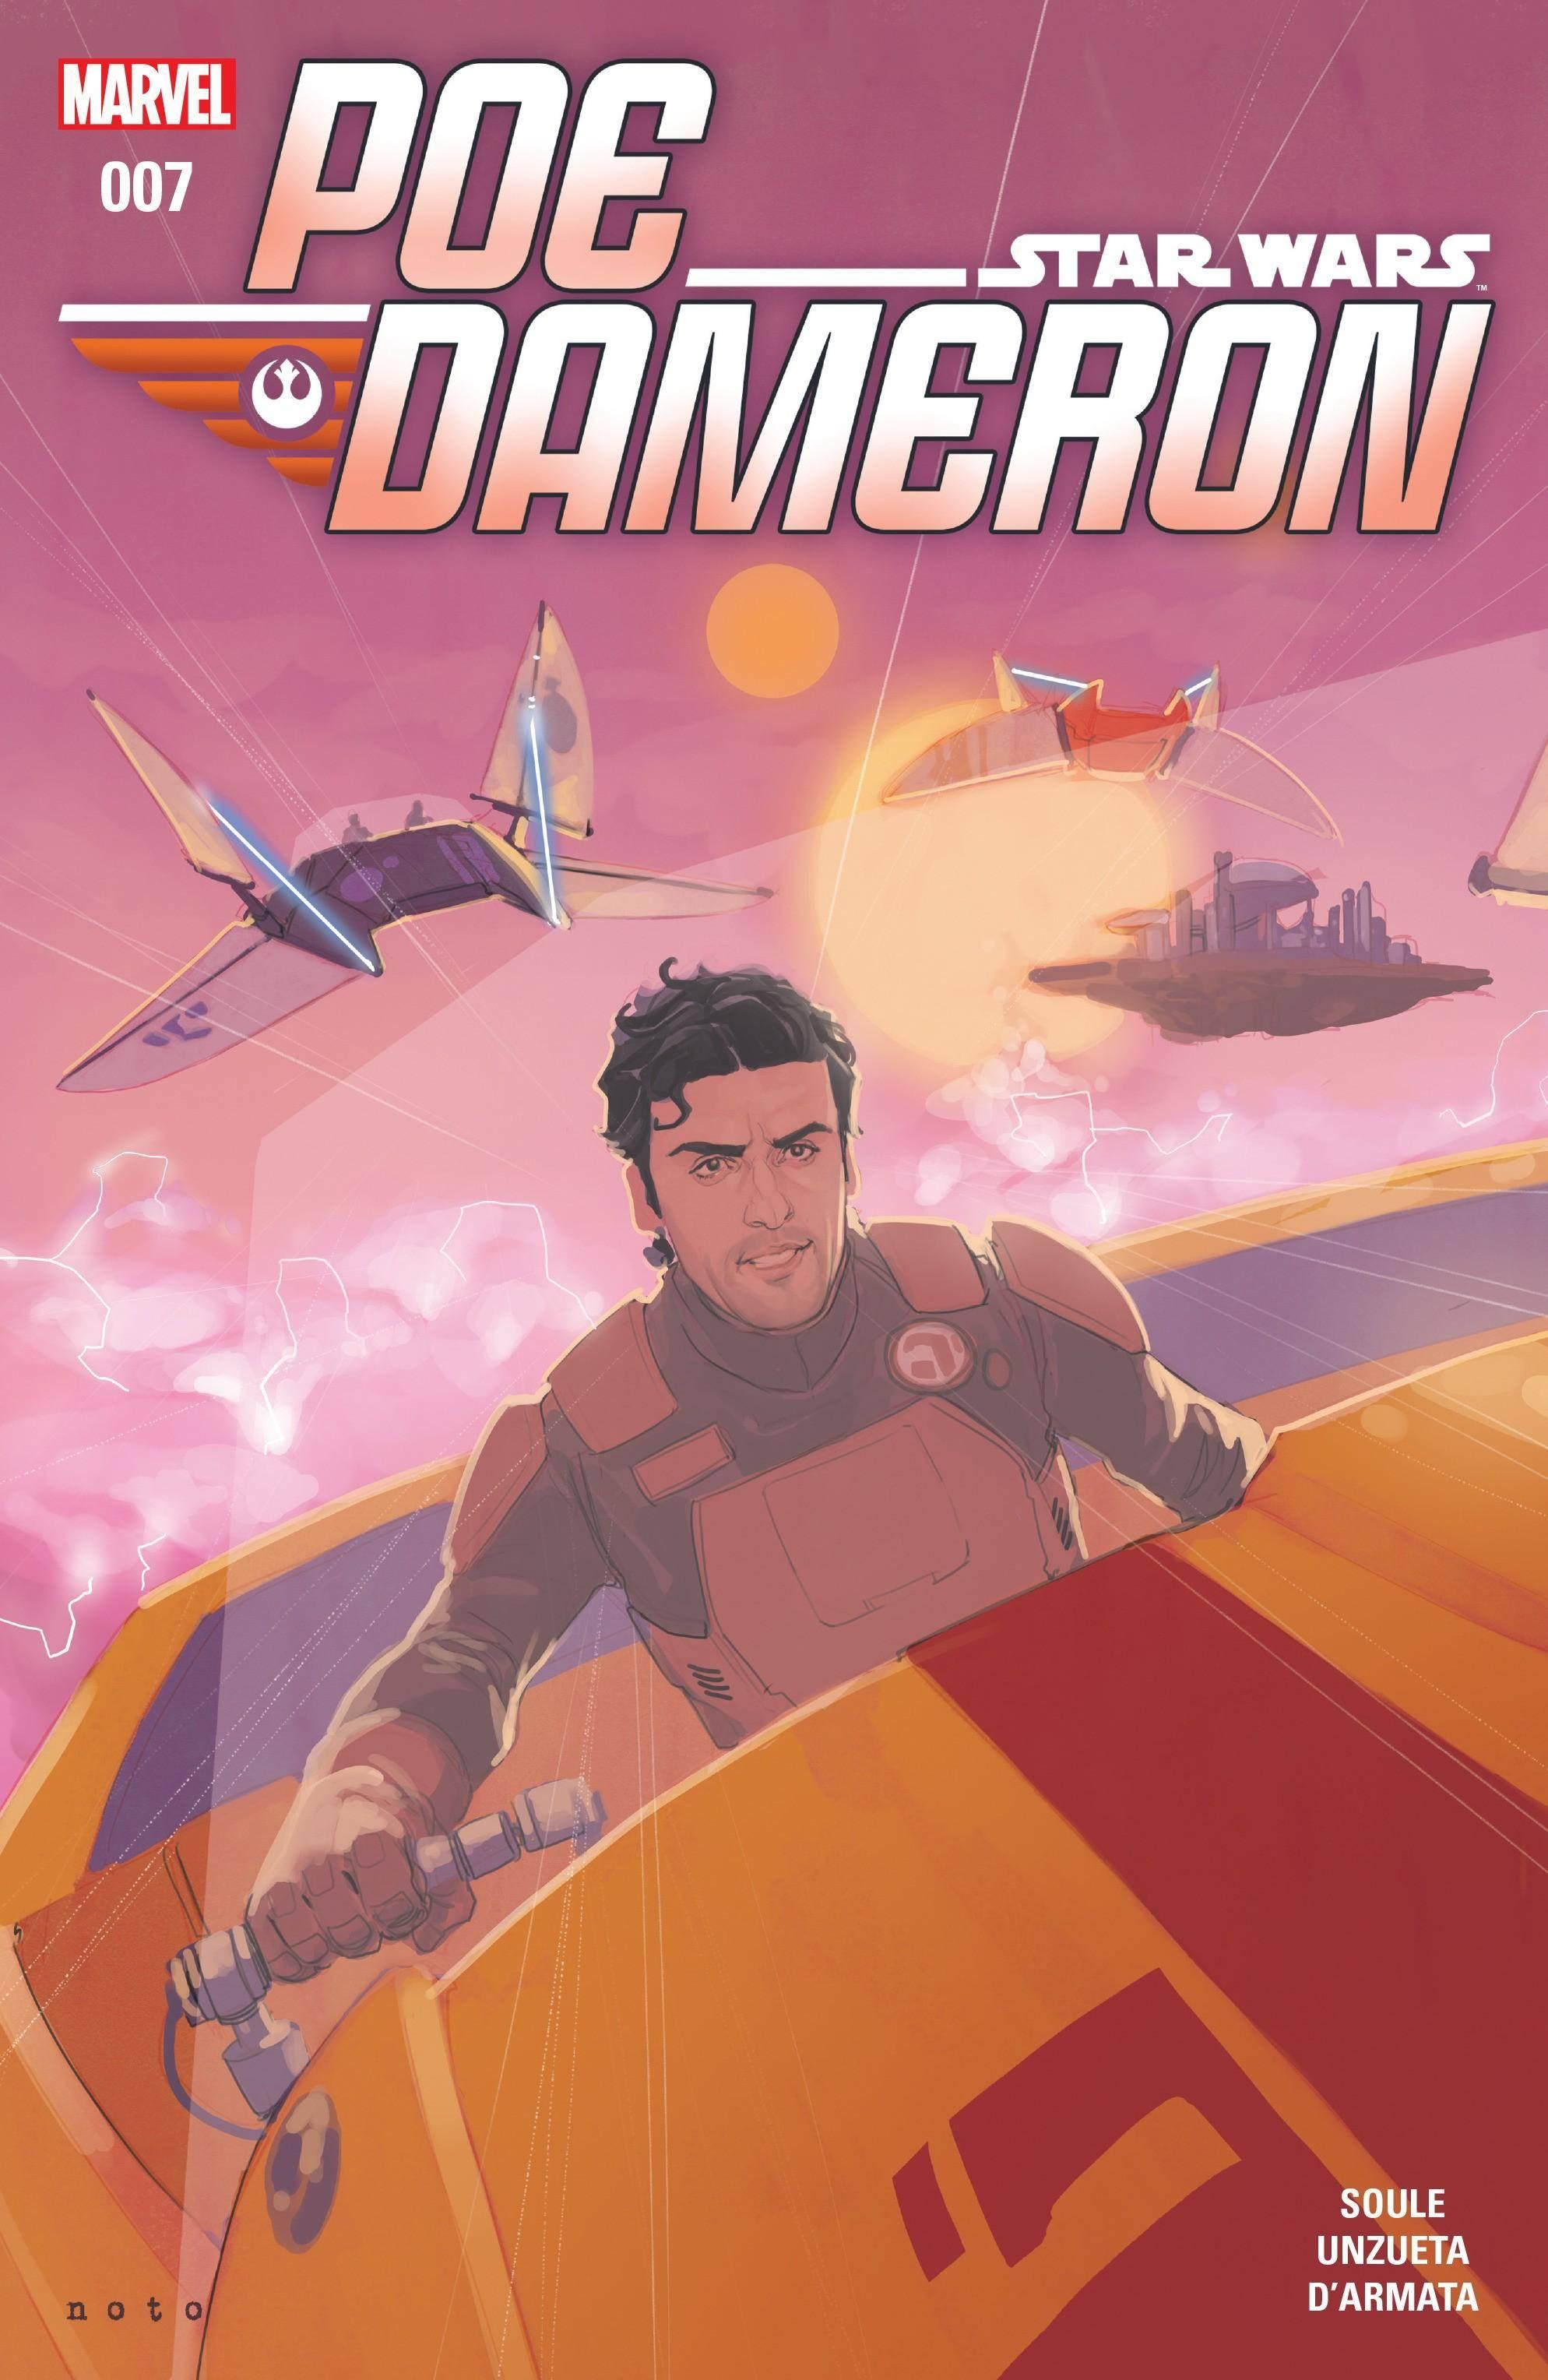 Poe Dameron 007 2016